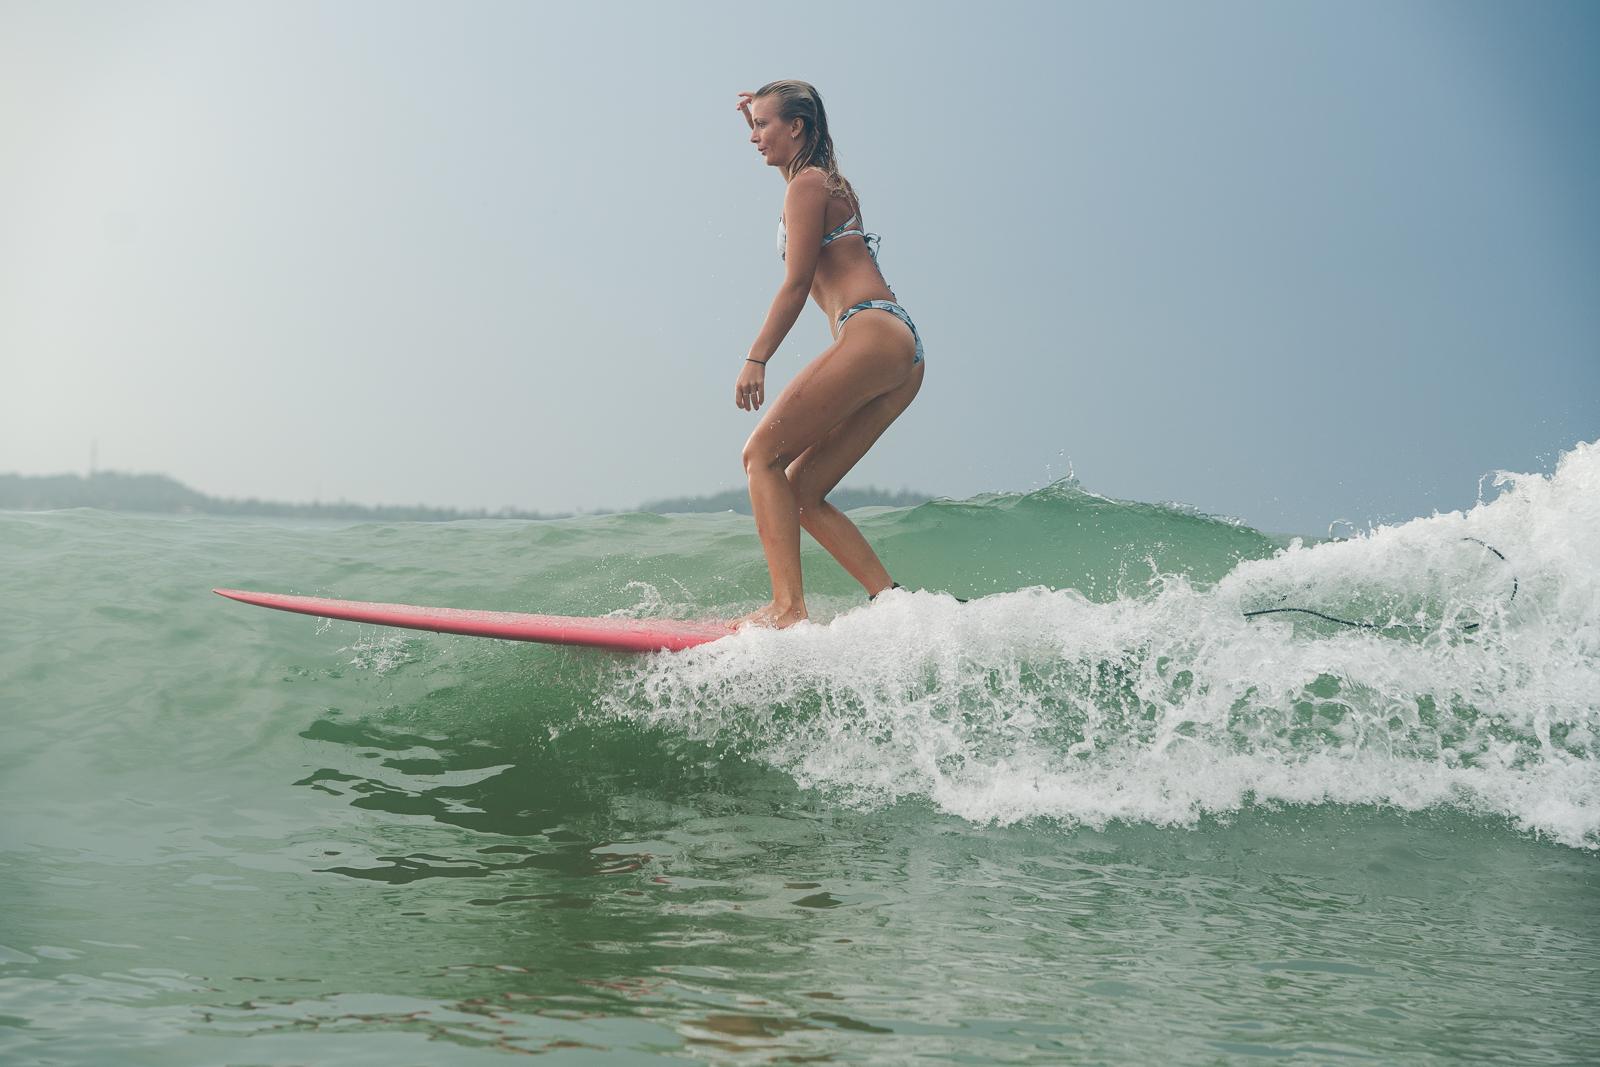 surfing-sri-lanka-bing-boards.jpg